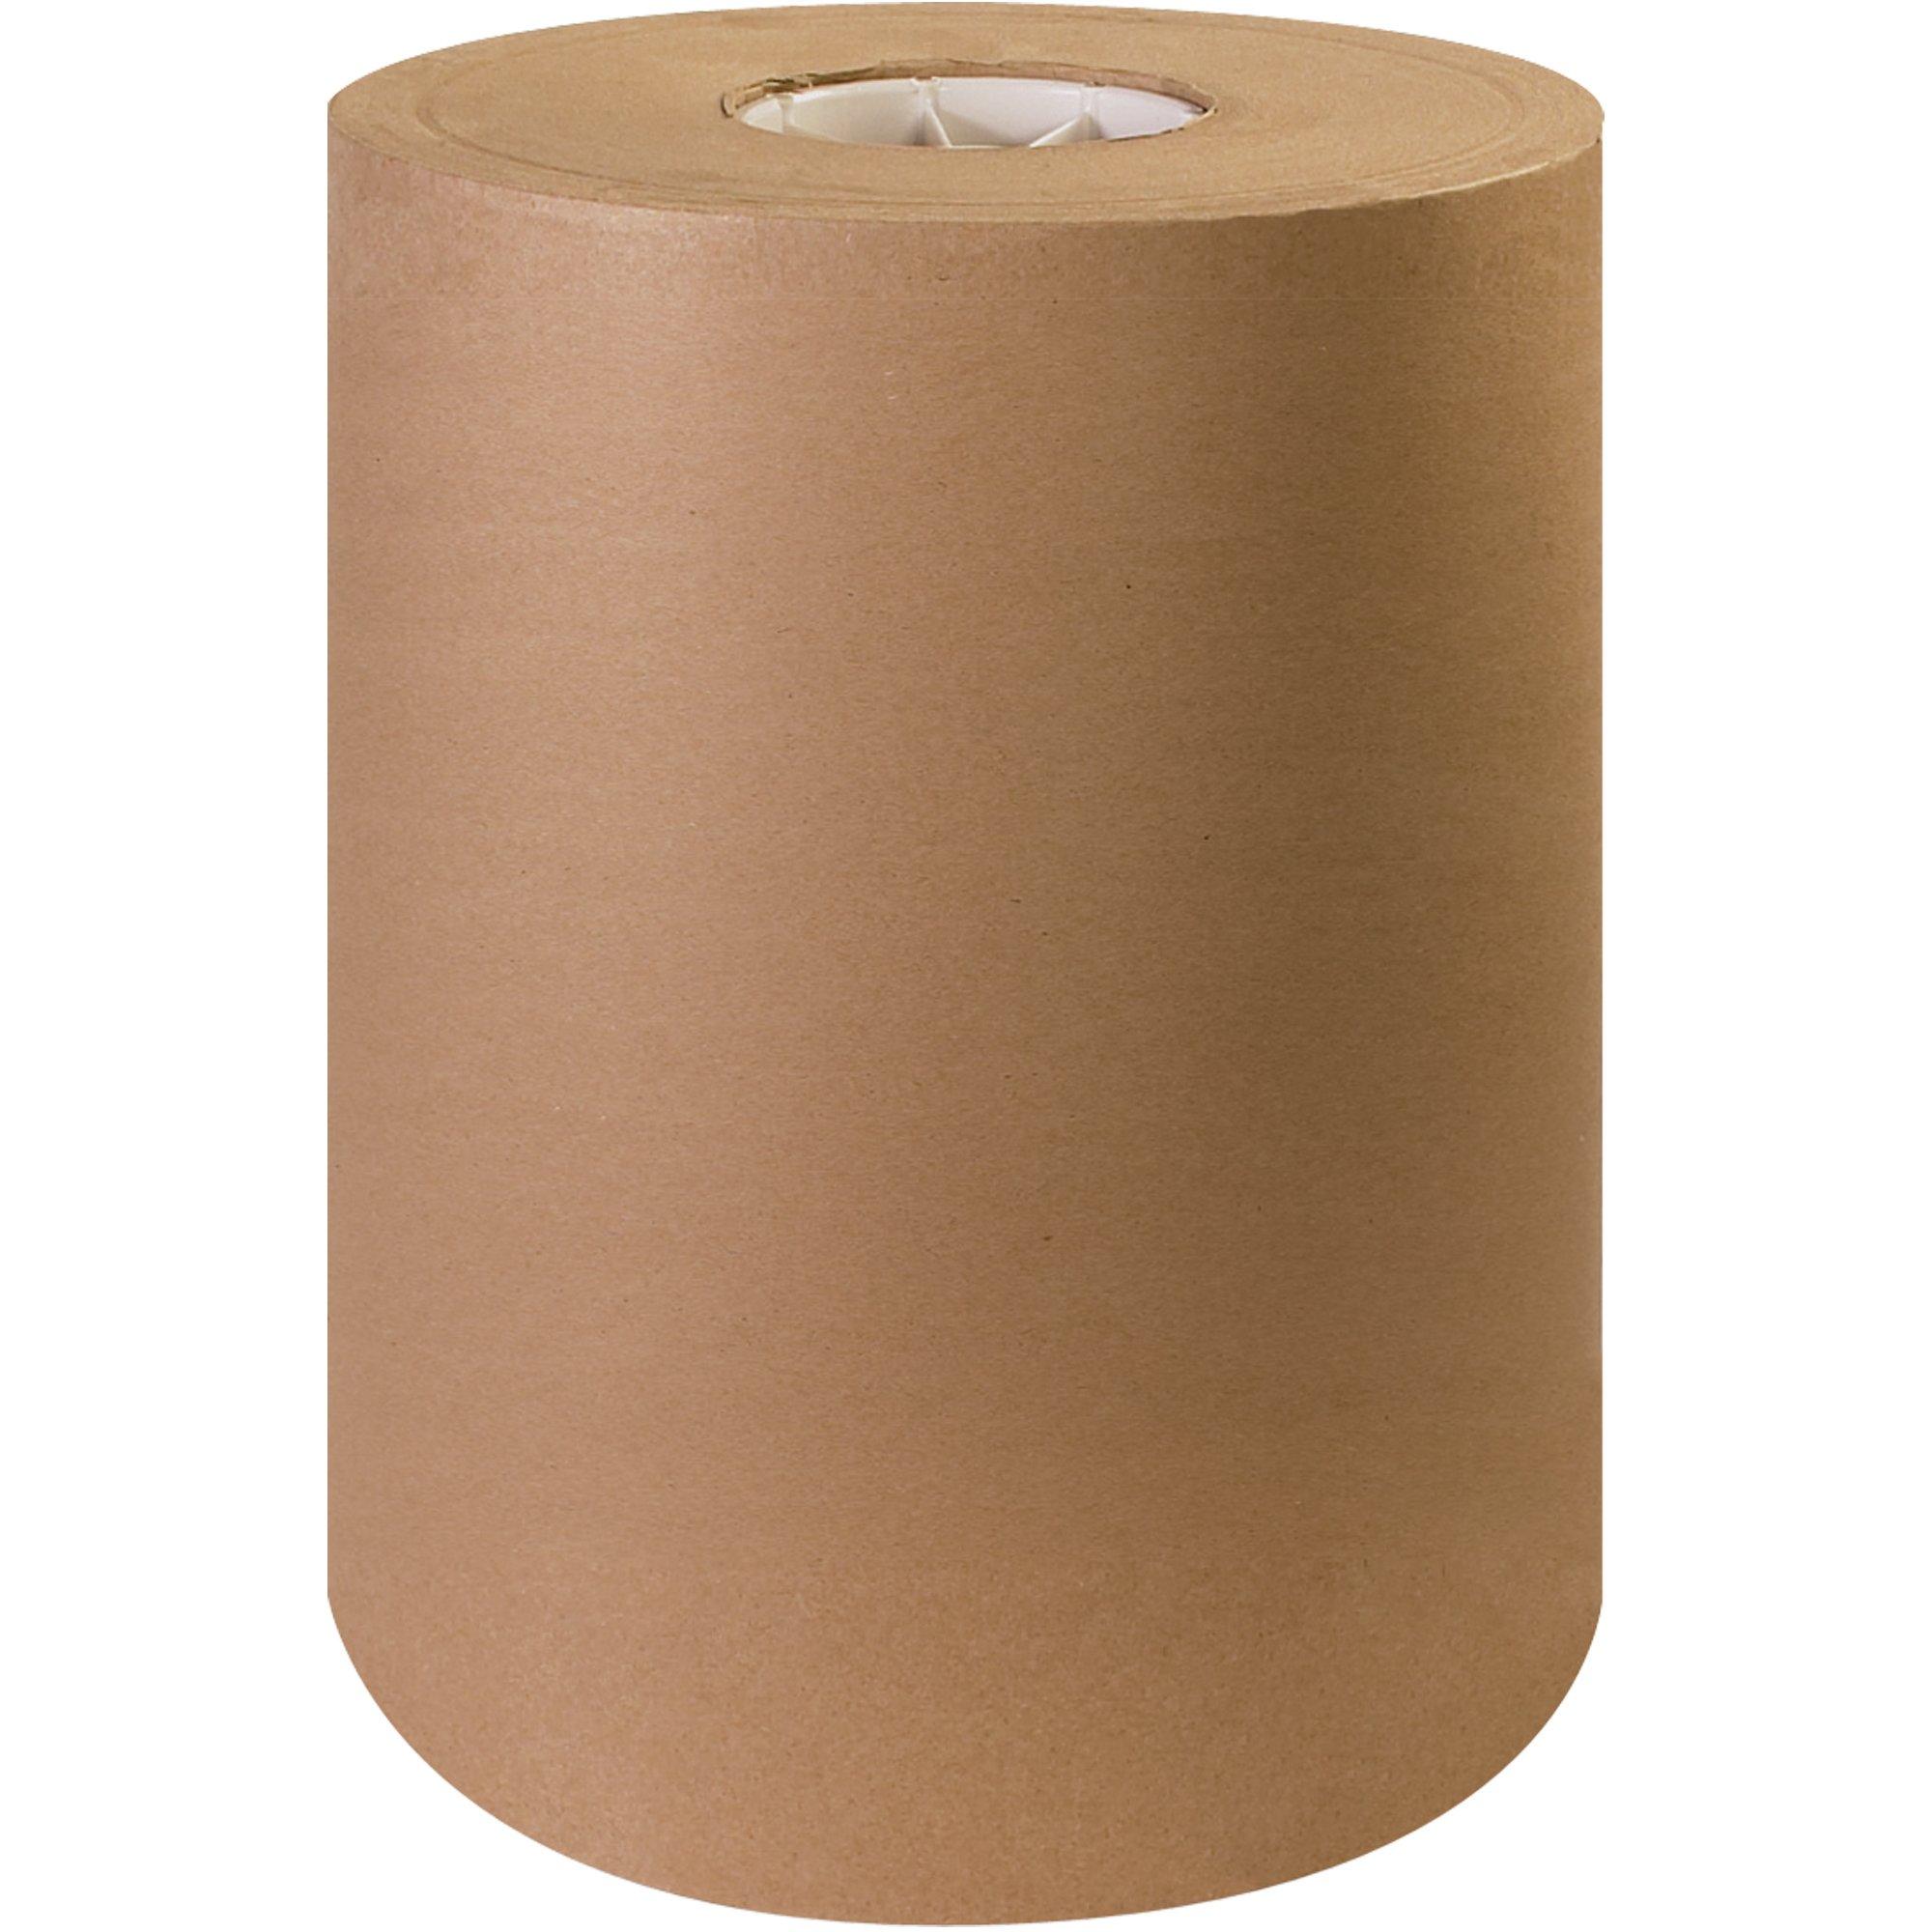 Kraft Paper Roll, 50#, 12'' x 1200', Kraft, 1/Roll by Choice Shipping Supplies